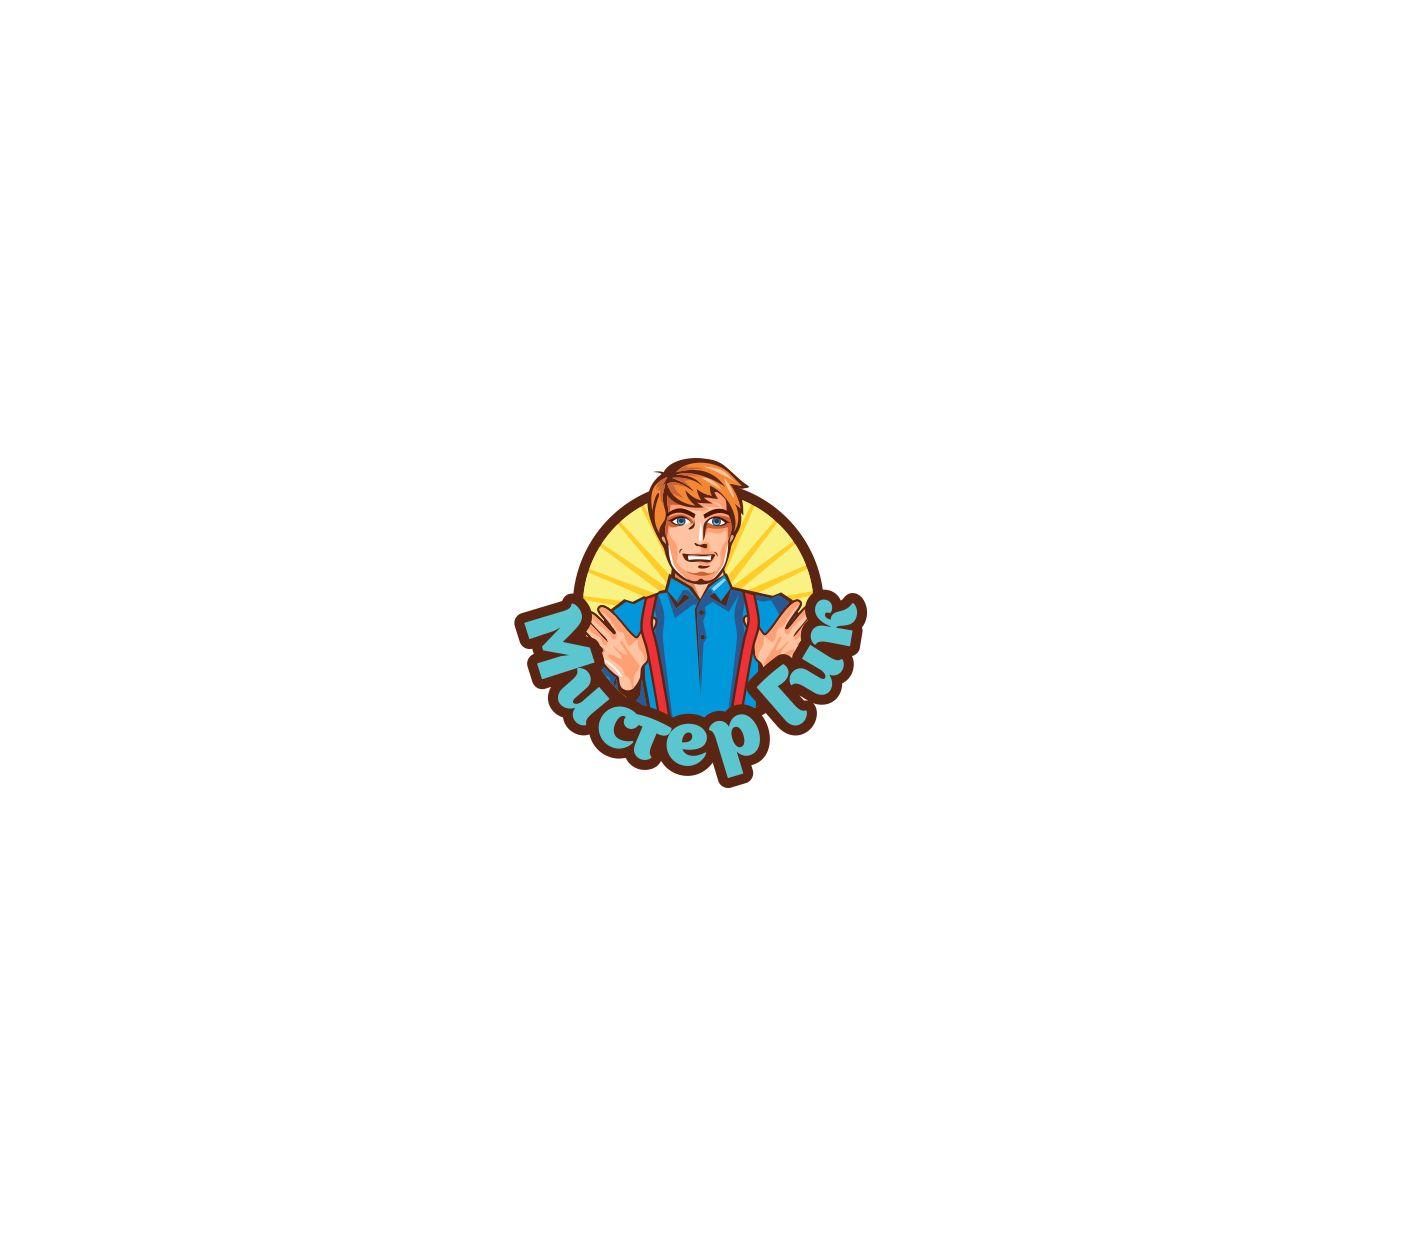 Логотип для магазина подарков - дизайнер remezlo